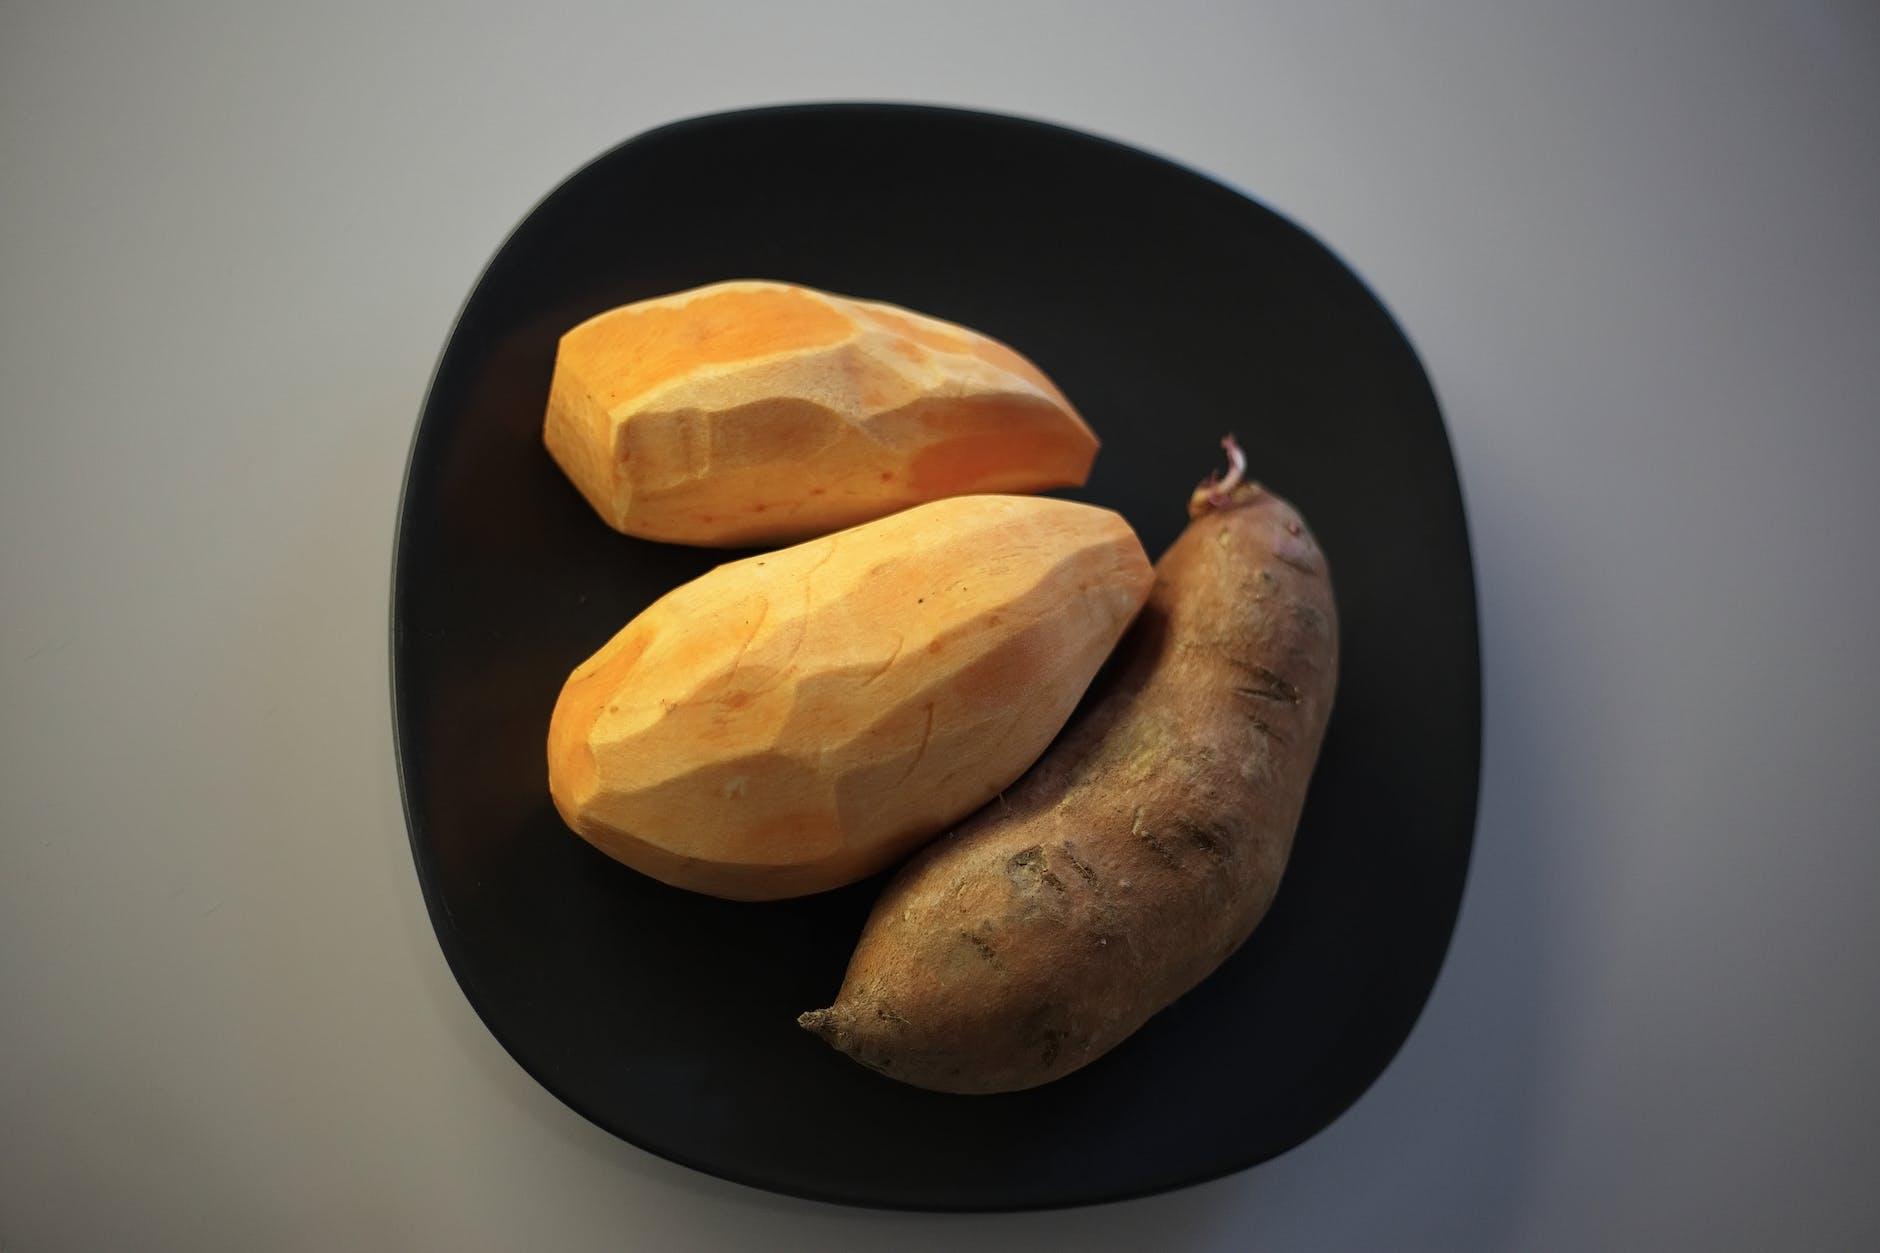 Sweet potatoes on black plate | Photo: Pexels